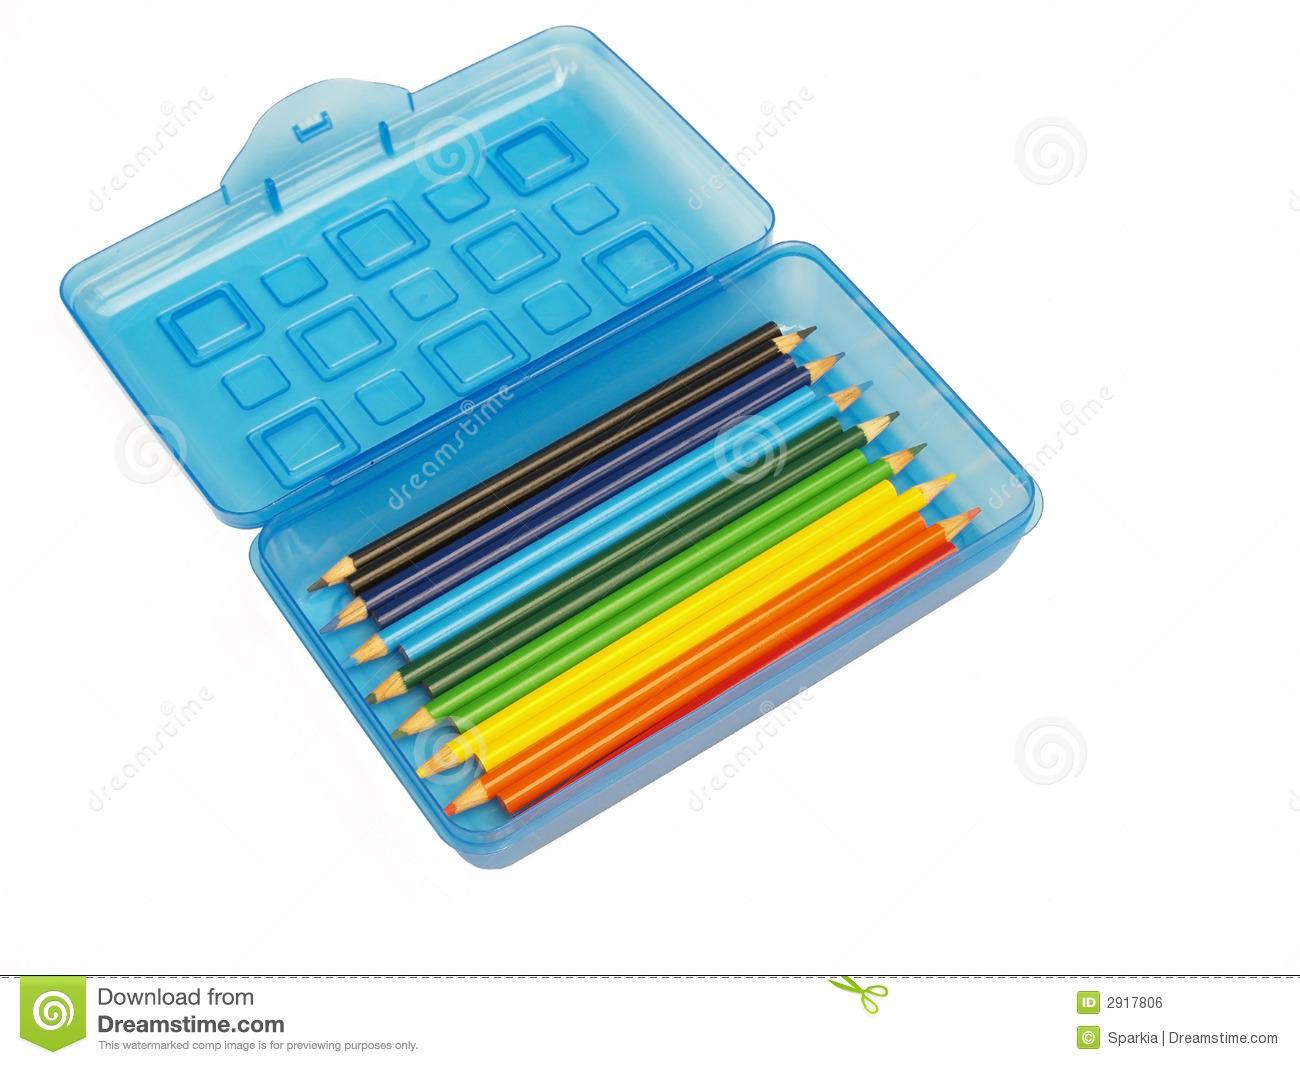 Pencil clipart pencil case Clipart Clipart Box Images plastic%20crayon%20box%20clipart